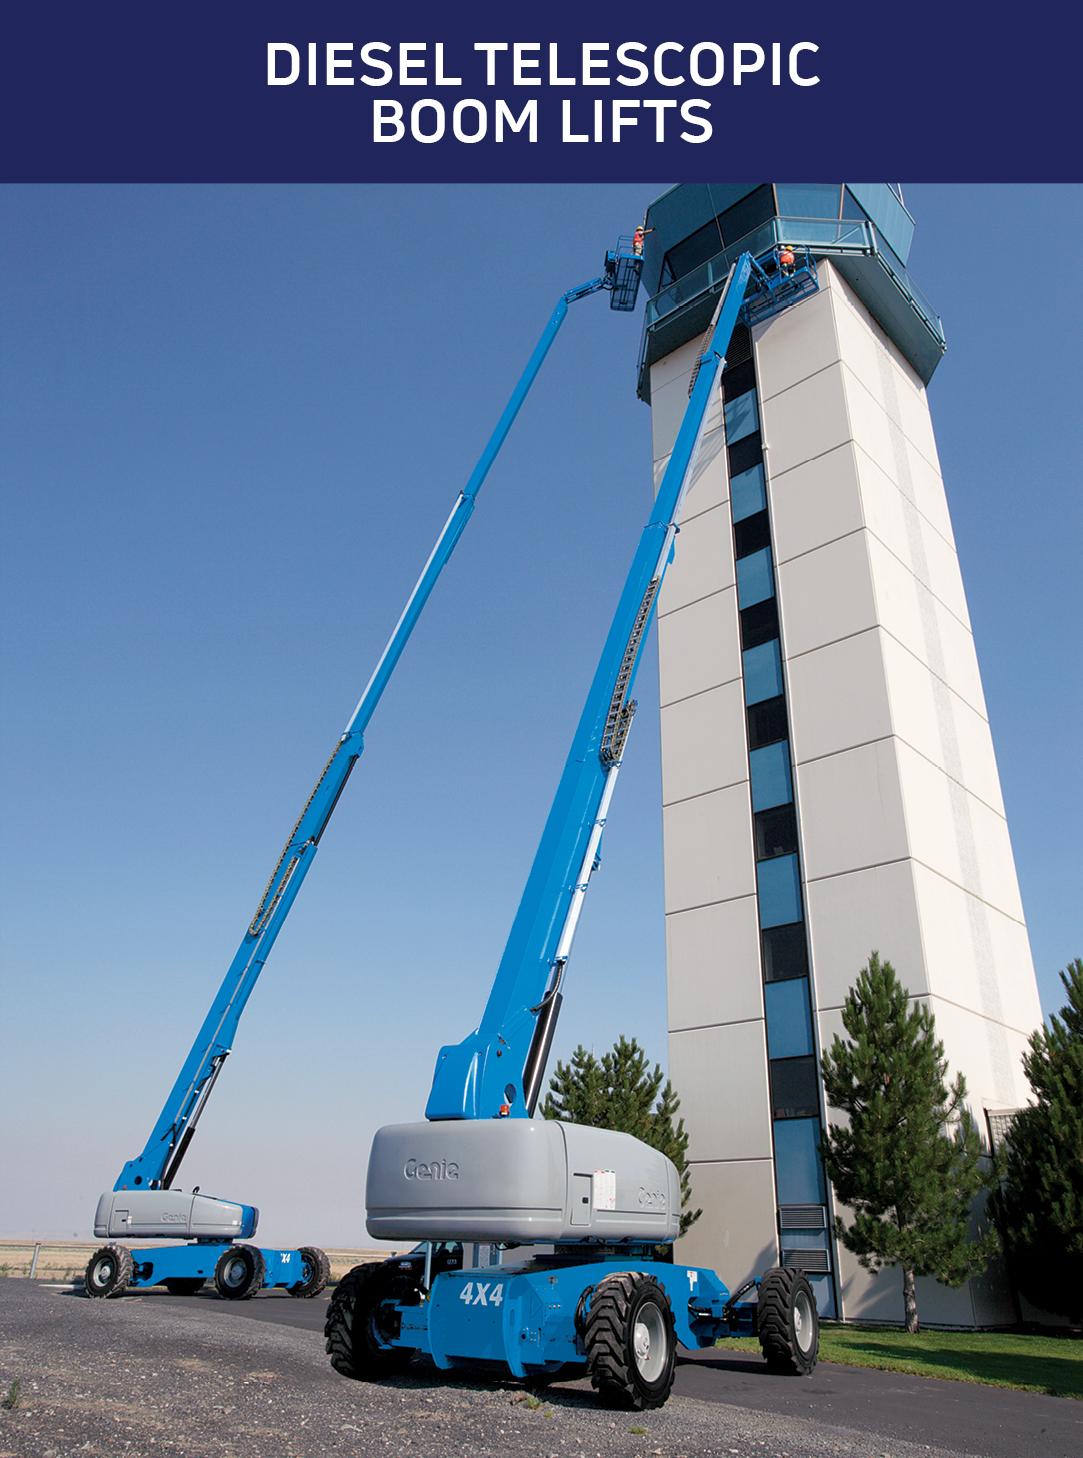 Diesel Telescopic Boom Lifts